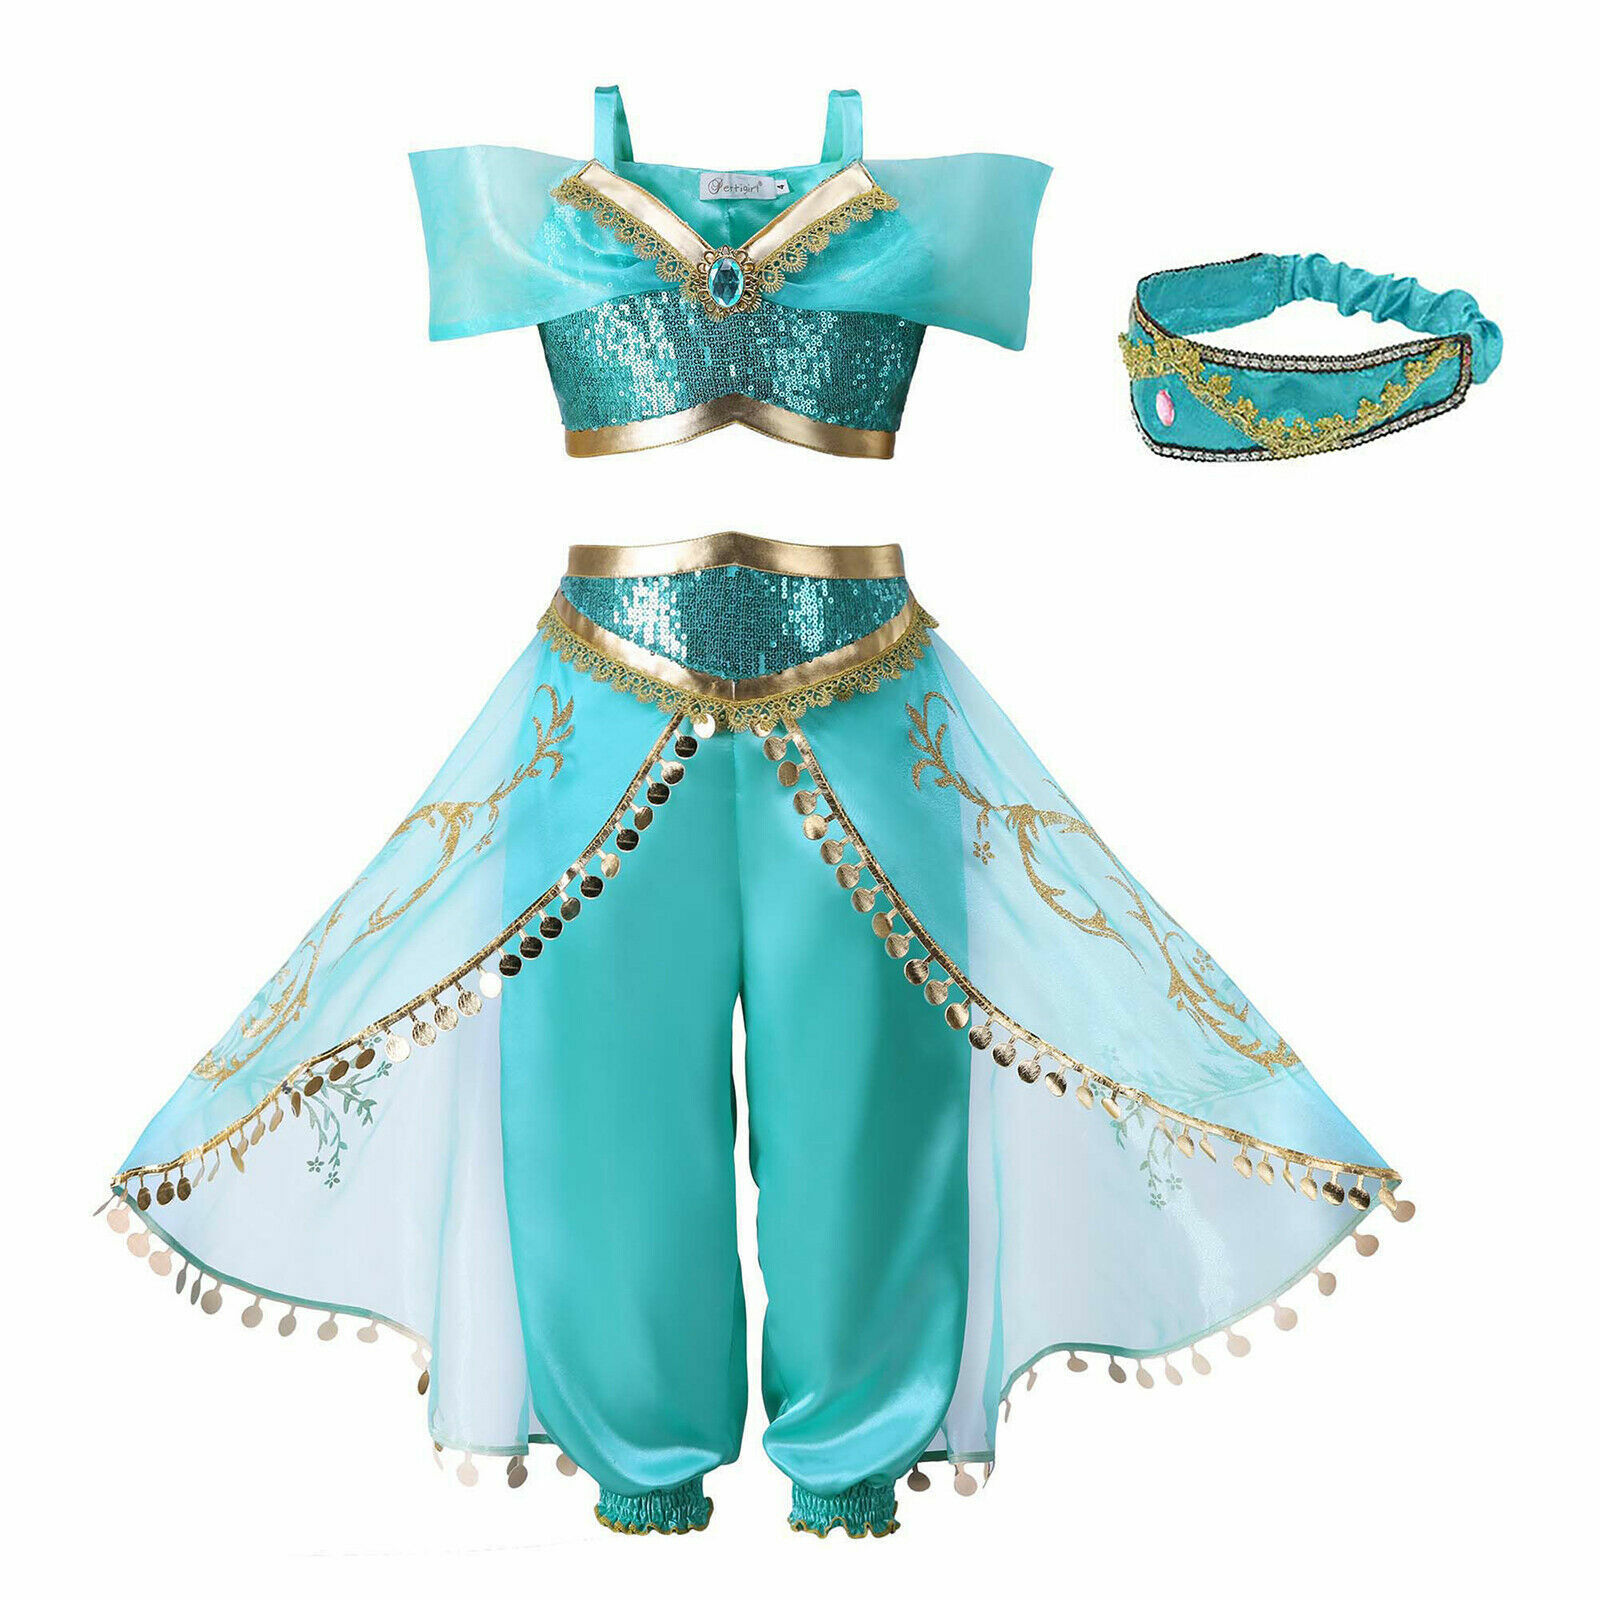 UK Seller Halloween Anna dress Party Costume Fancy dress Kids Girls Age 3-8